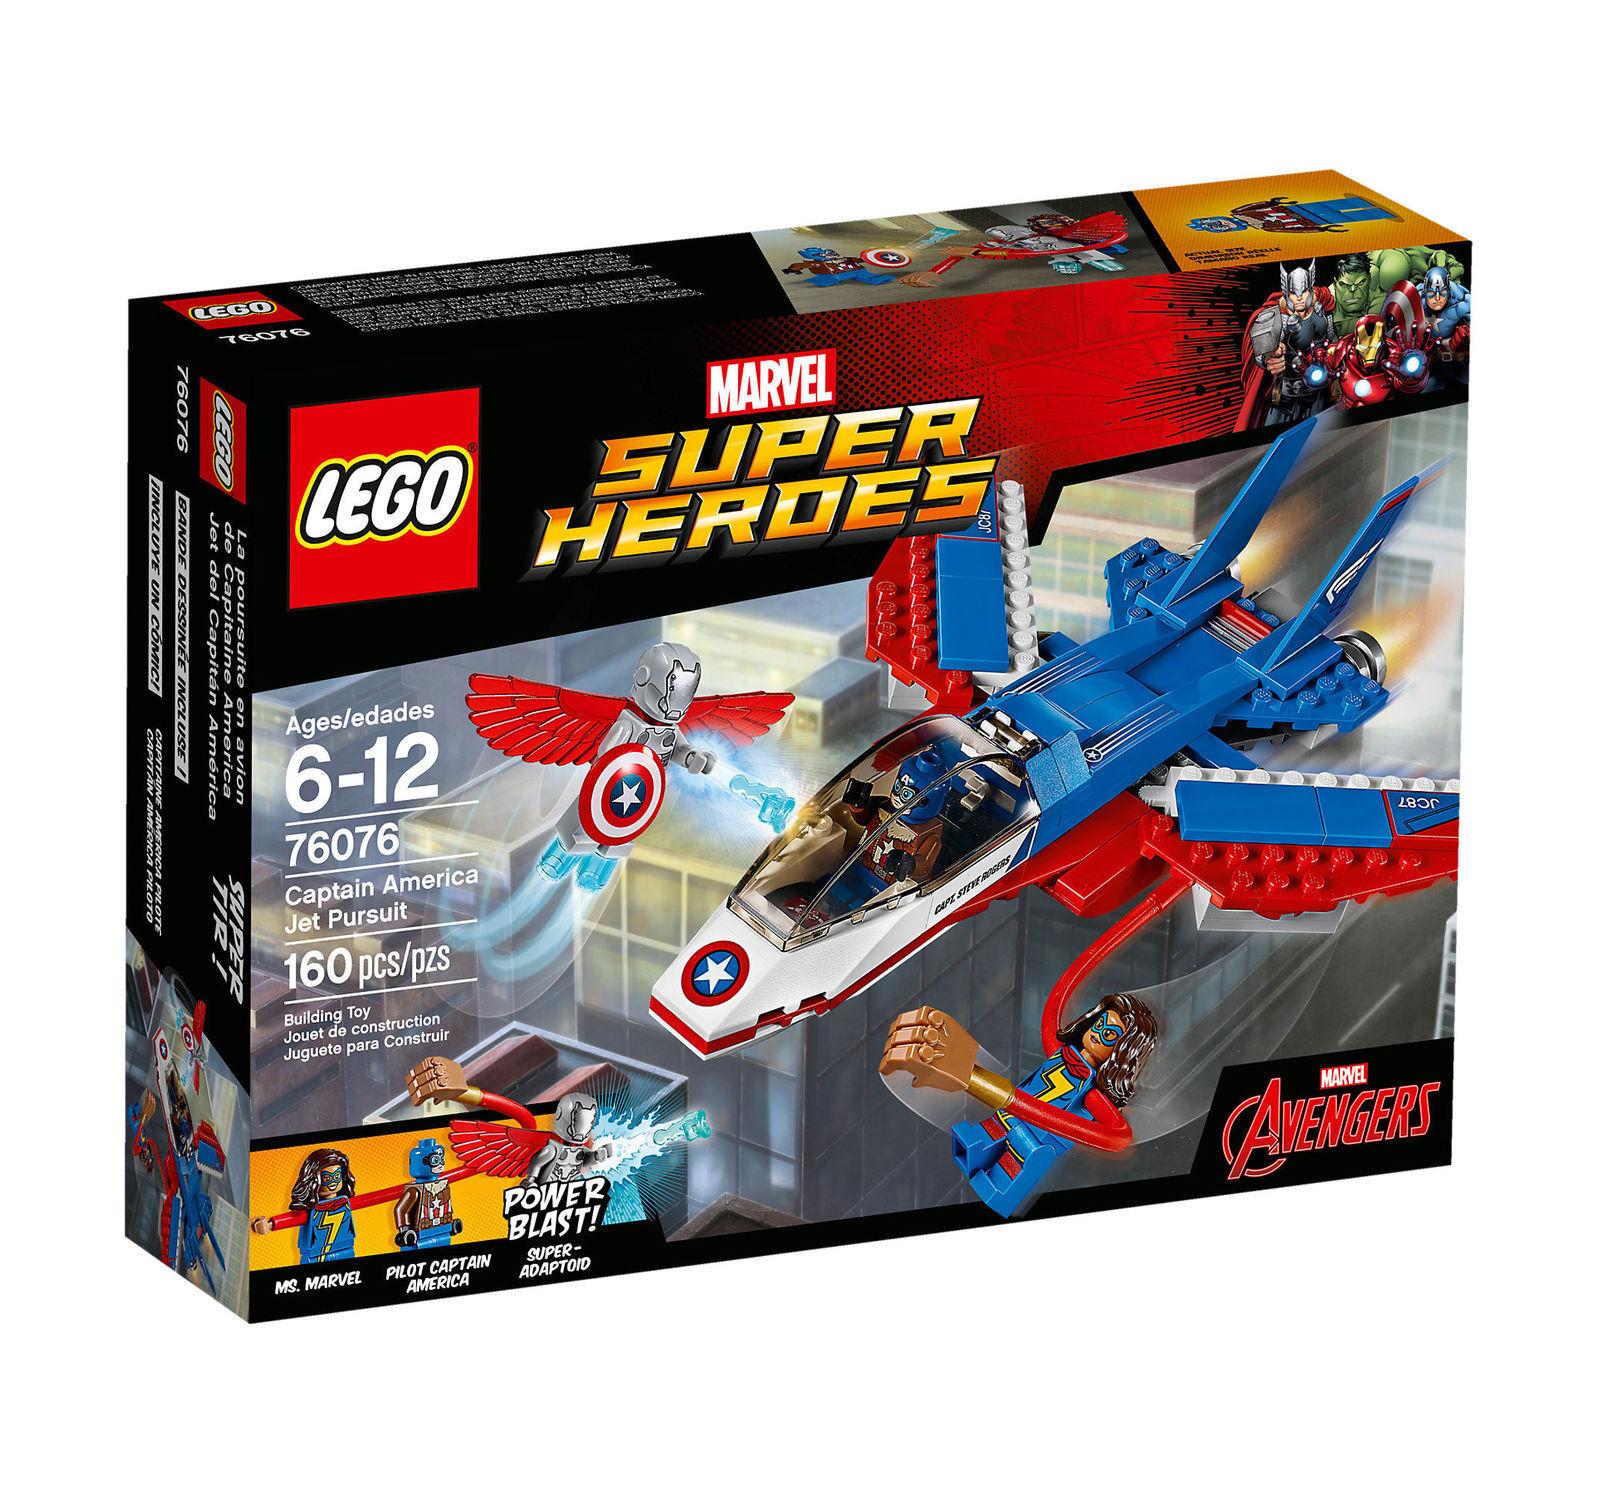 LEGO 76076 Marvel Super Heroes Captain America Jet Pursuit Superhero Toy